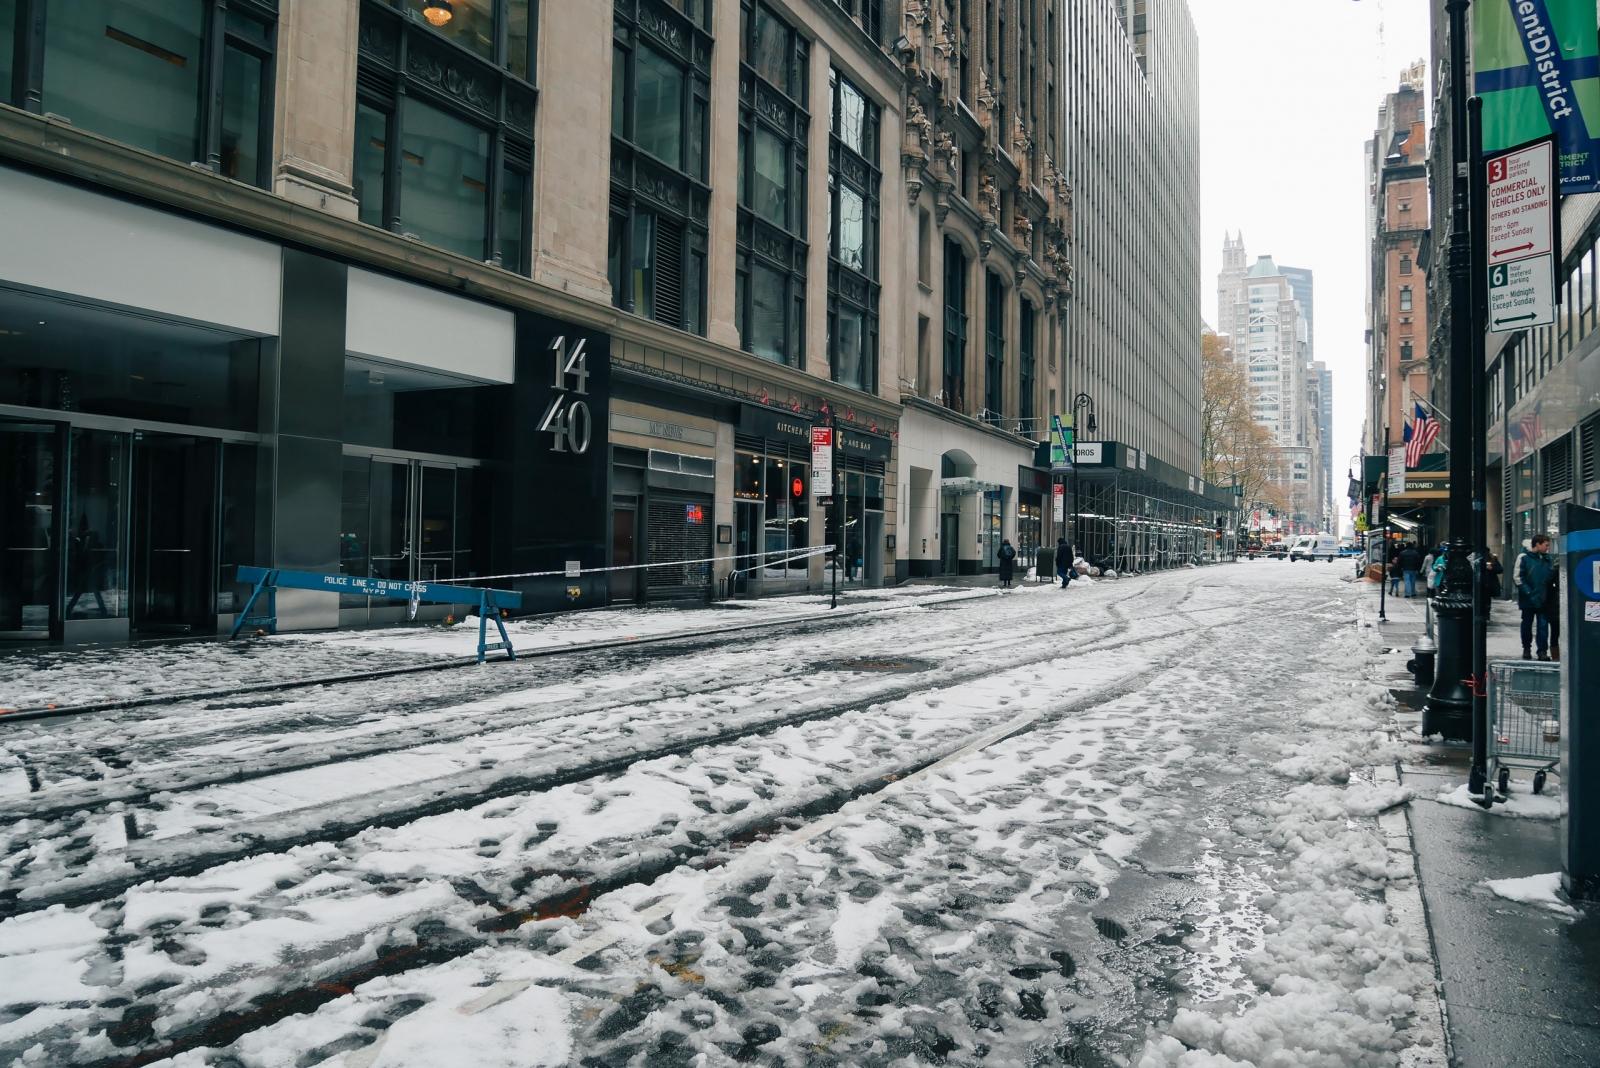 Slush on the streets of New York